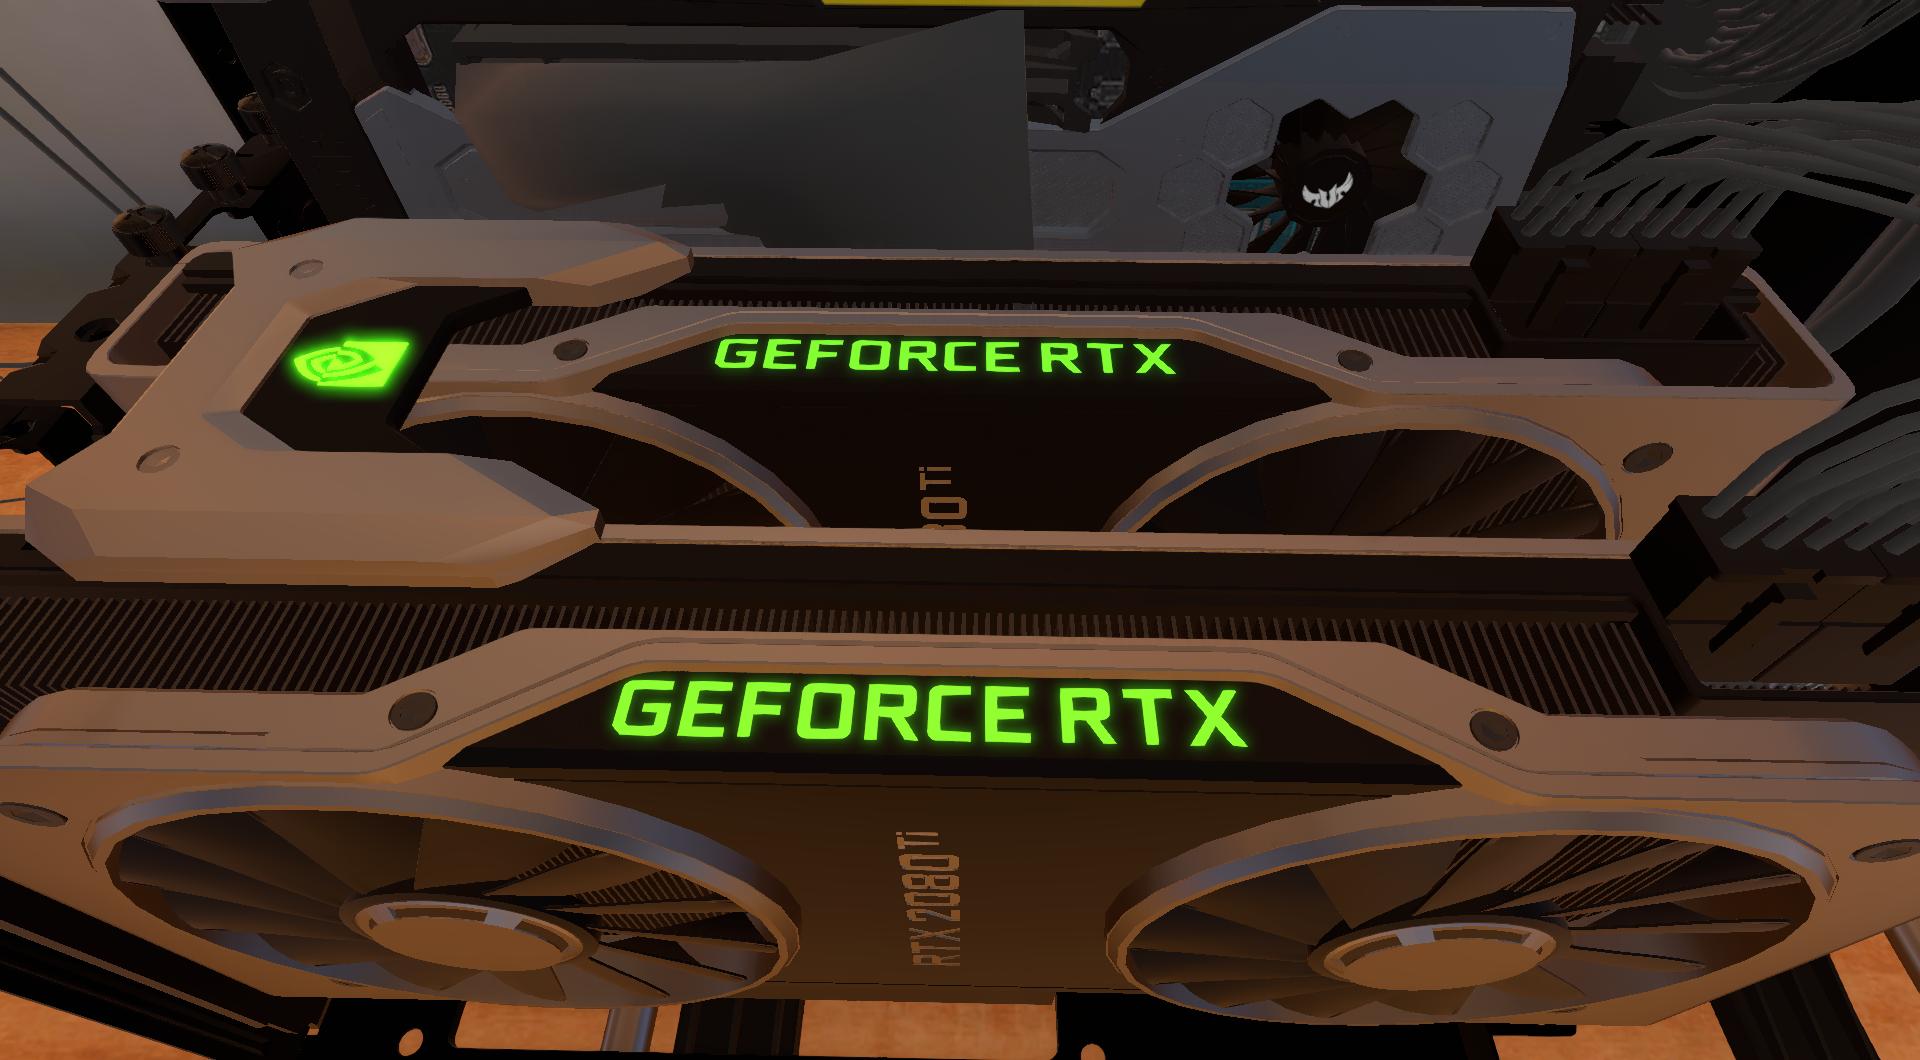 PC Building Simulator adds GeForce RTX GPUs As It Leaves